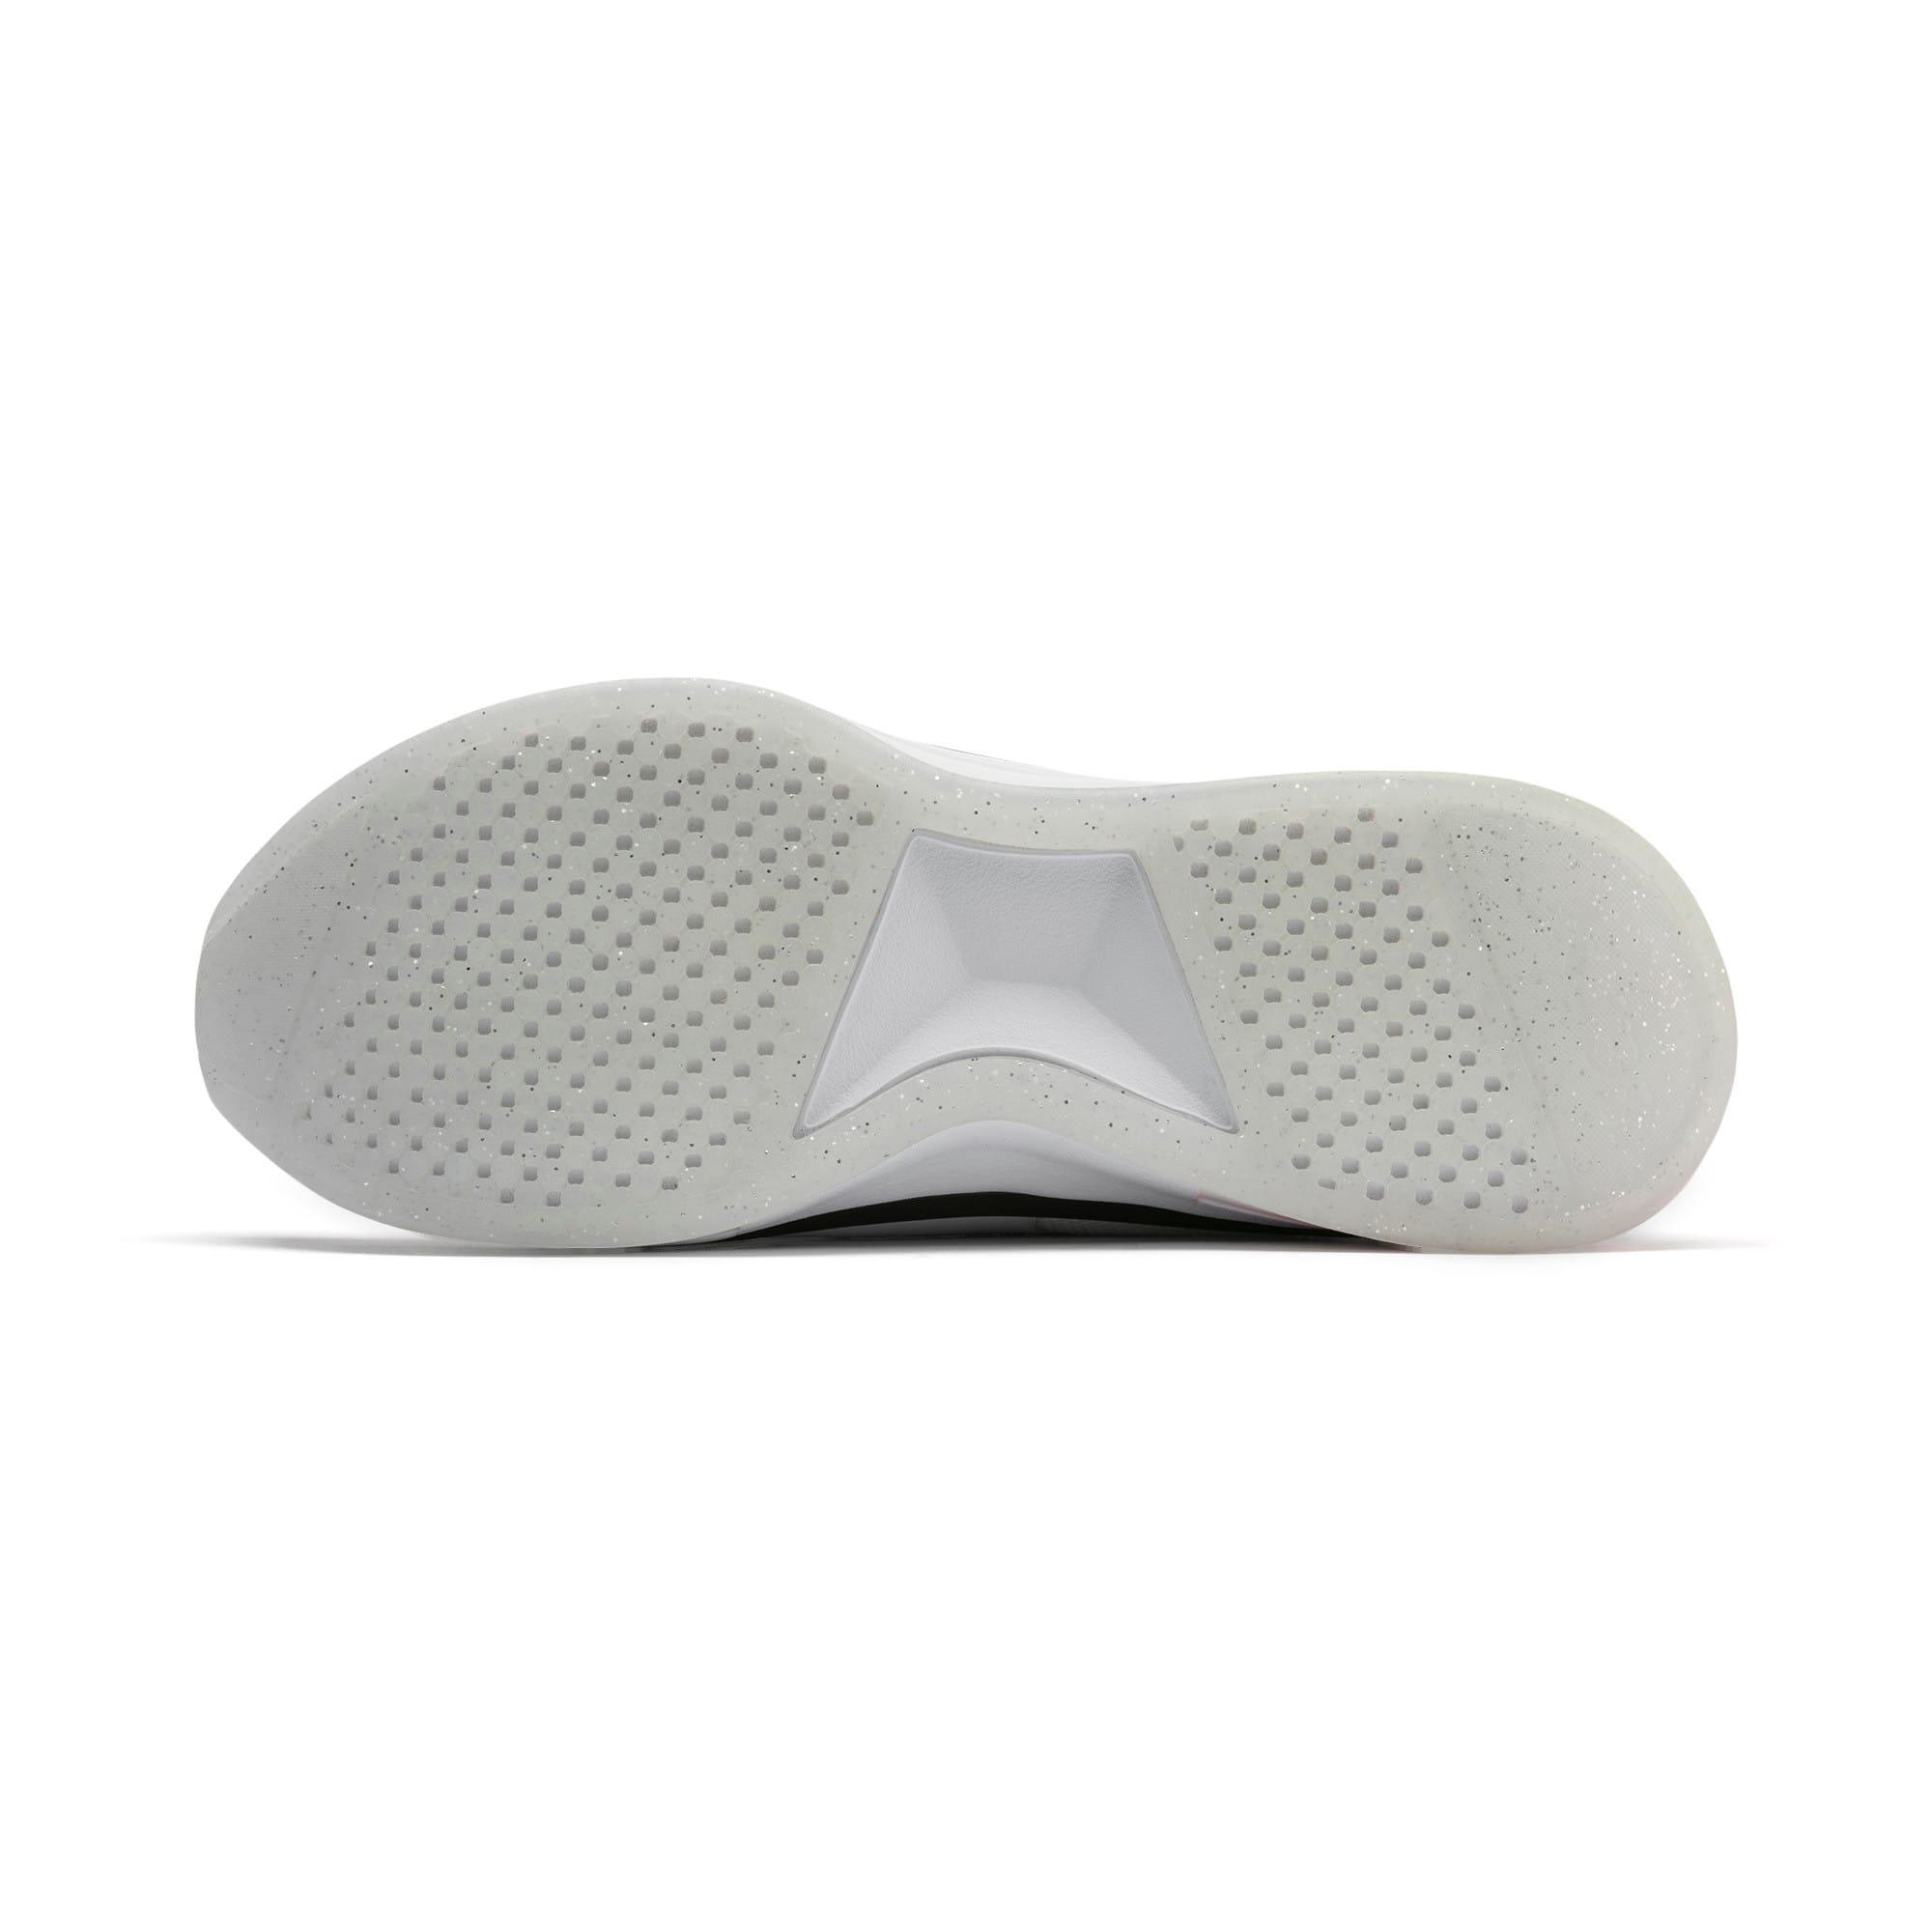 Miniatura 5 de Zapatos de entrenamiento SG Slip-On Glitz para mujer, Puma White-Puma Black, mediano